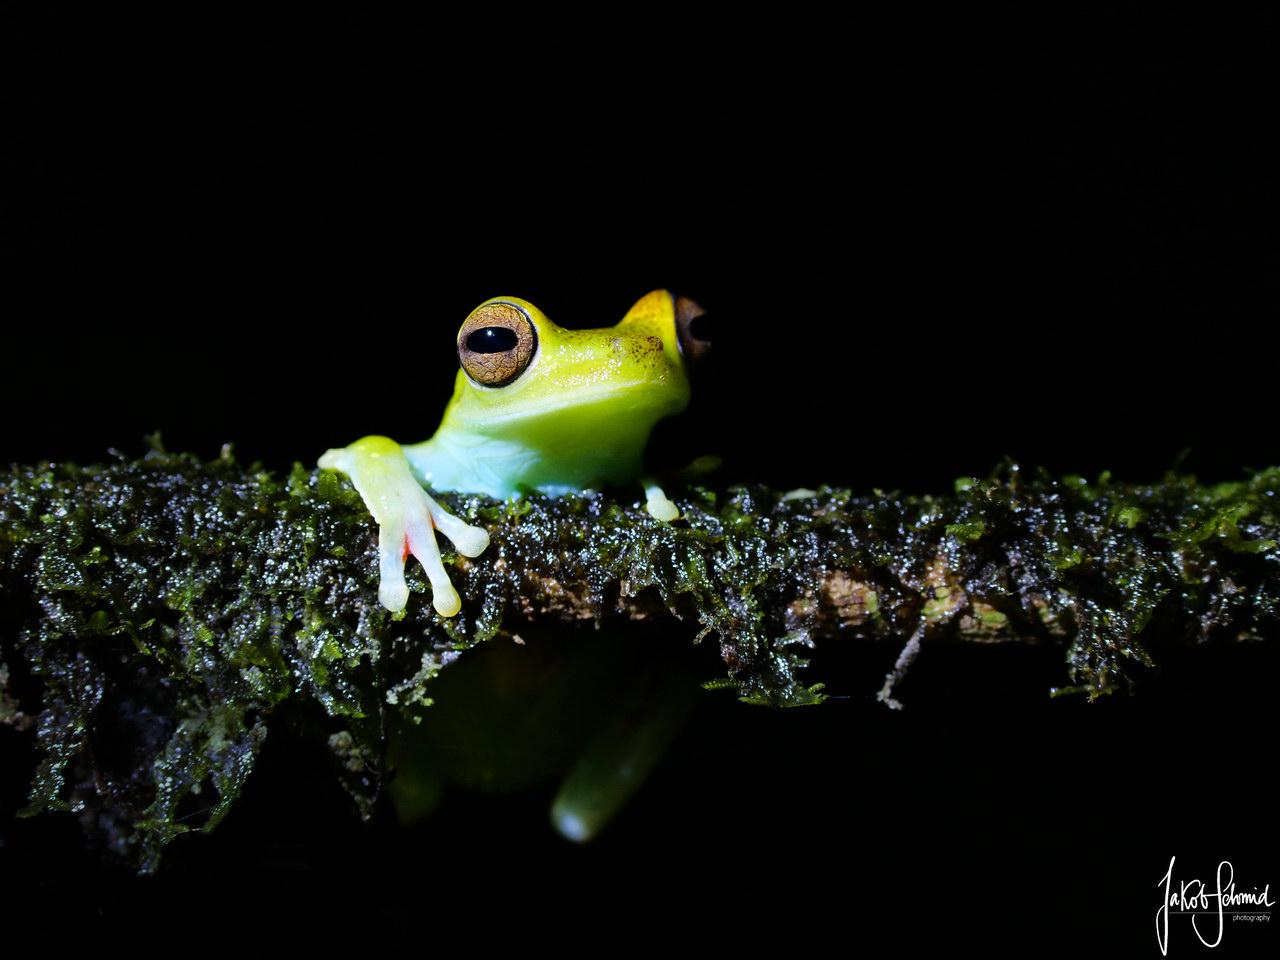 Costa Rica Laubfrosch